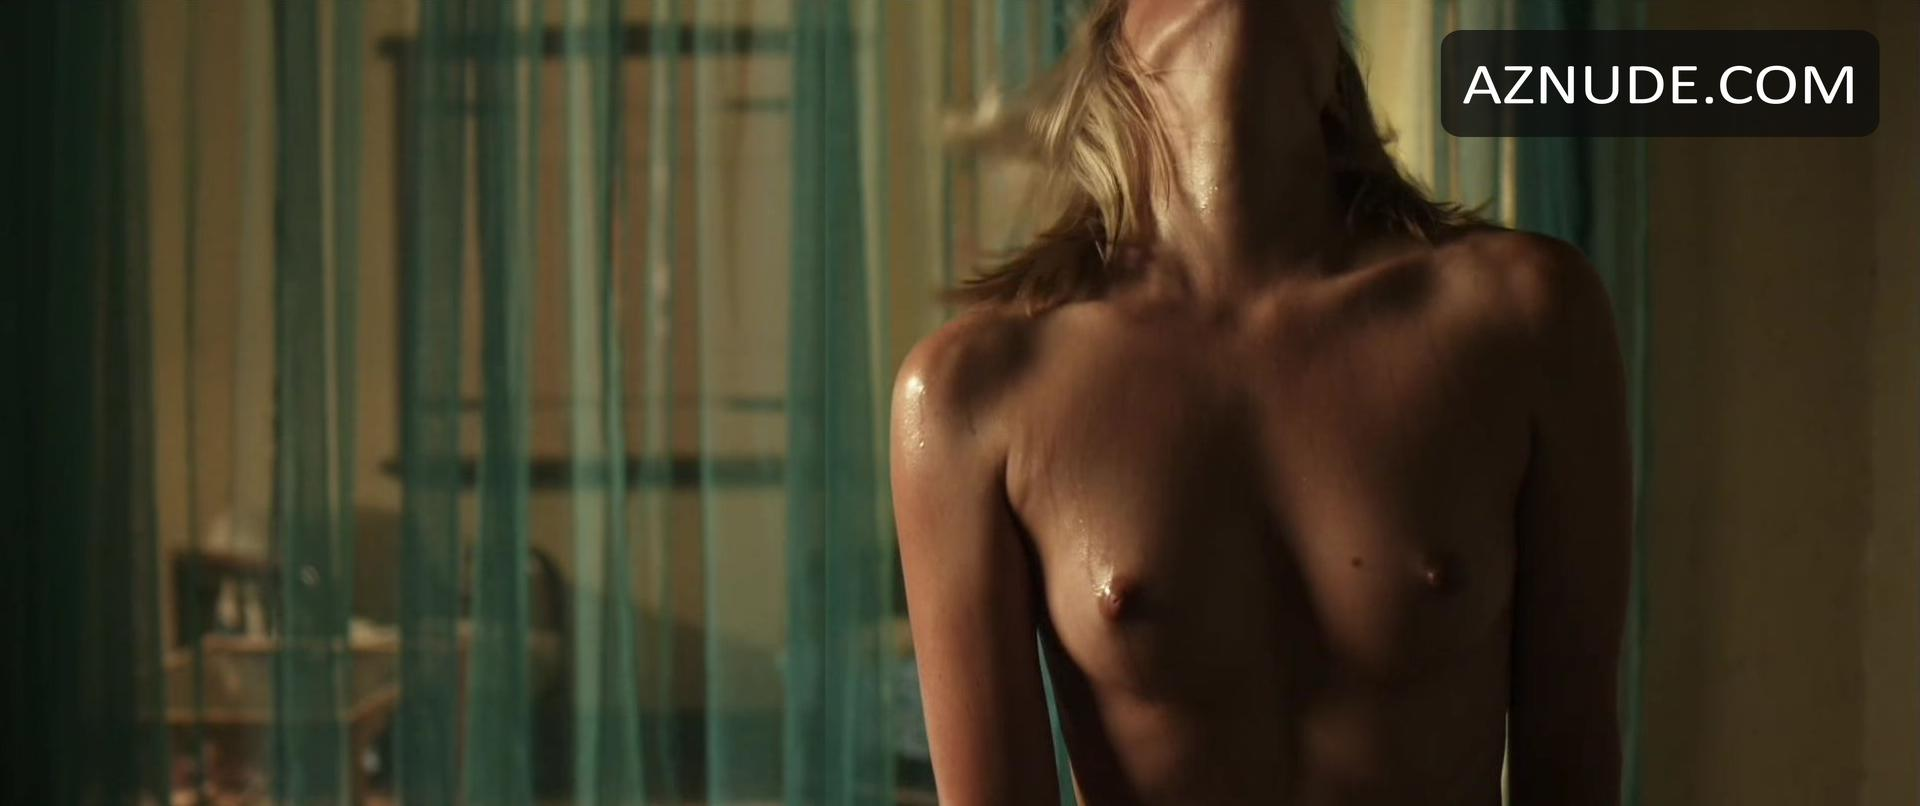 Lea walker nude photos